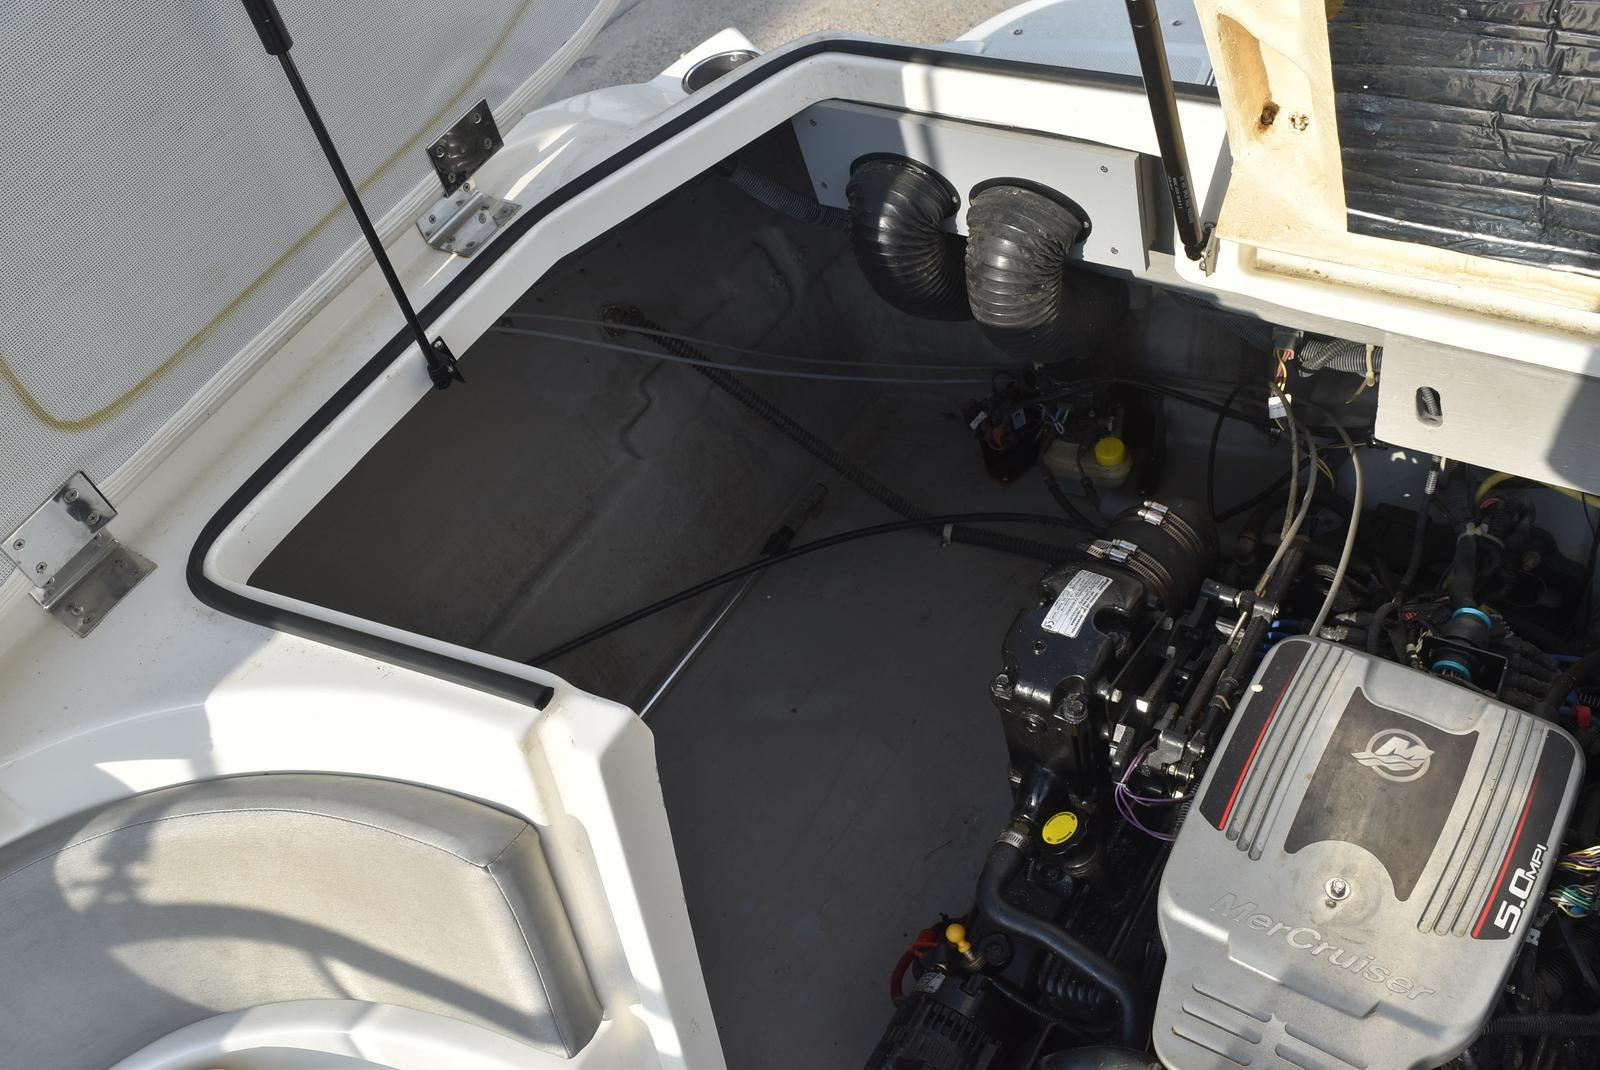 2010 Bayliner boat for sale, model of the boat is 235BR & Image # 15 of 43